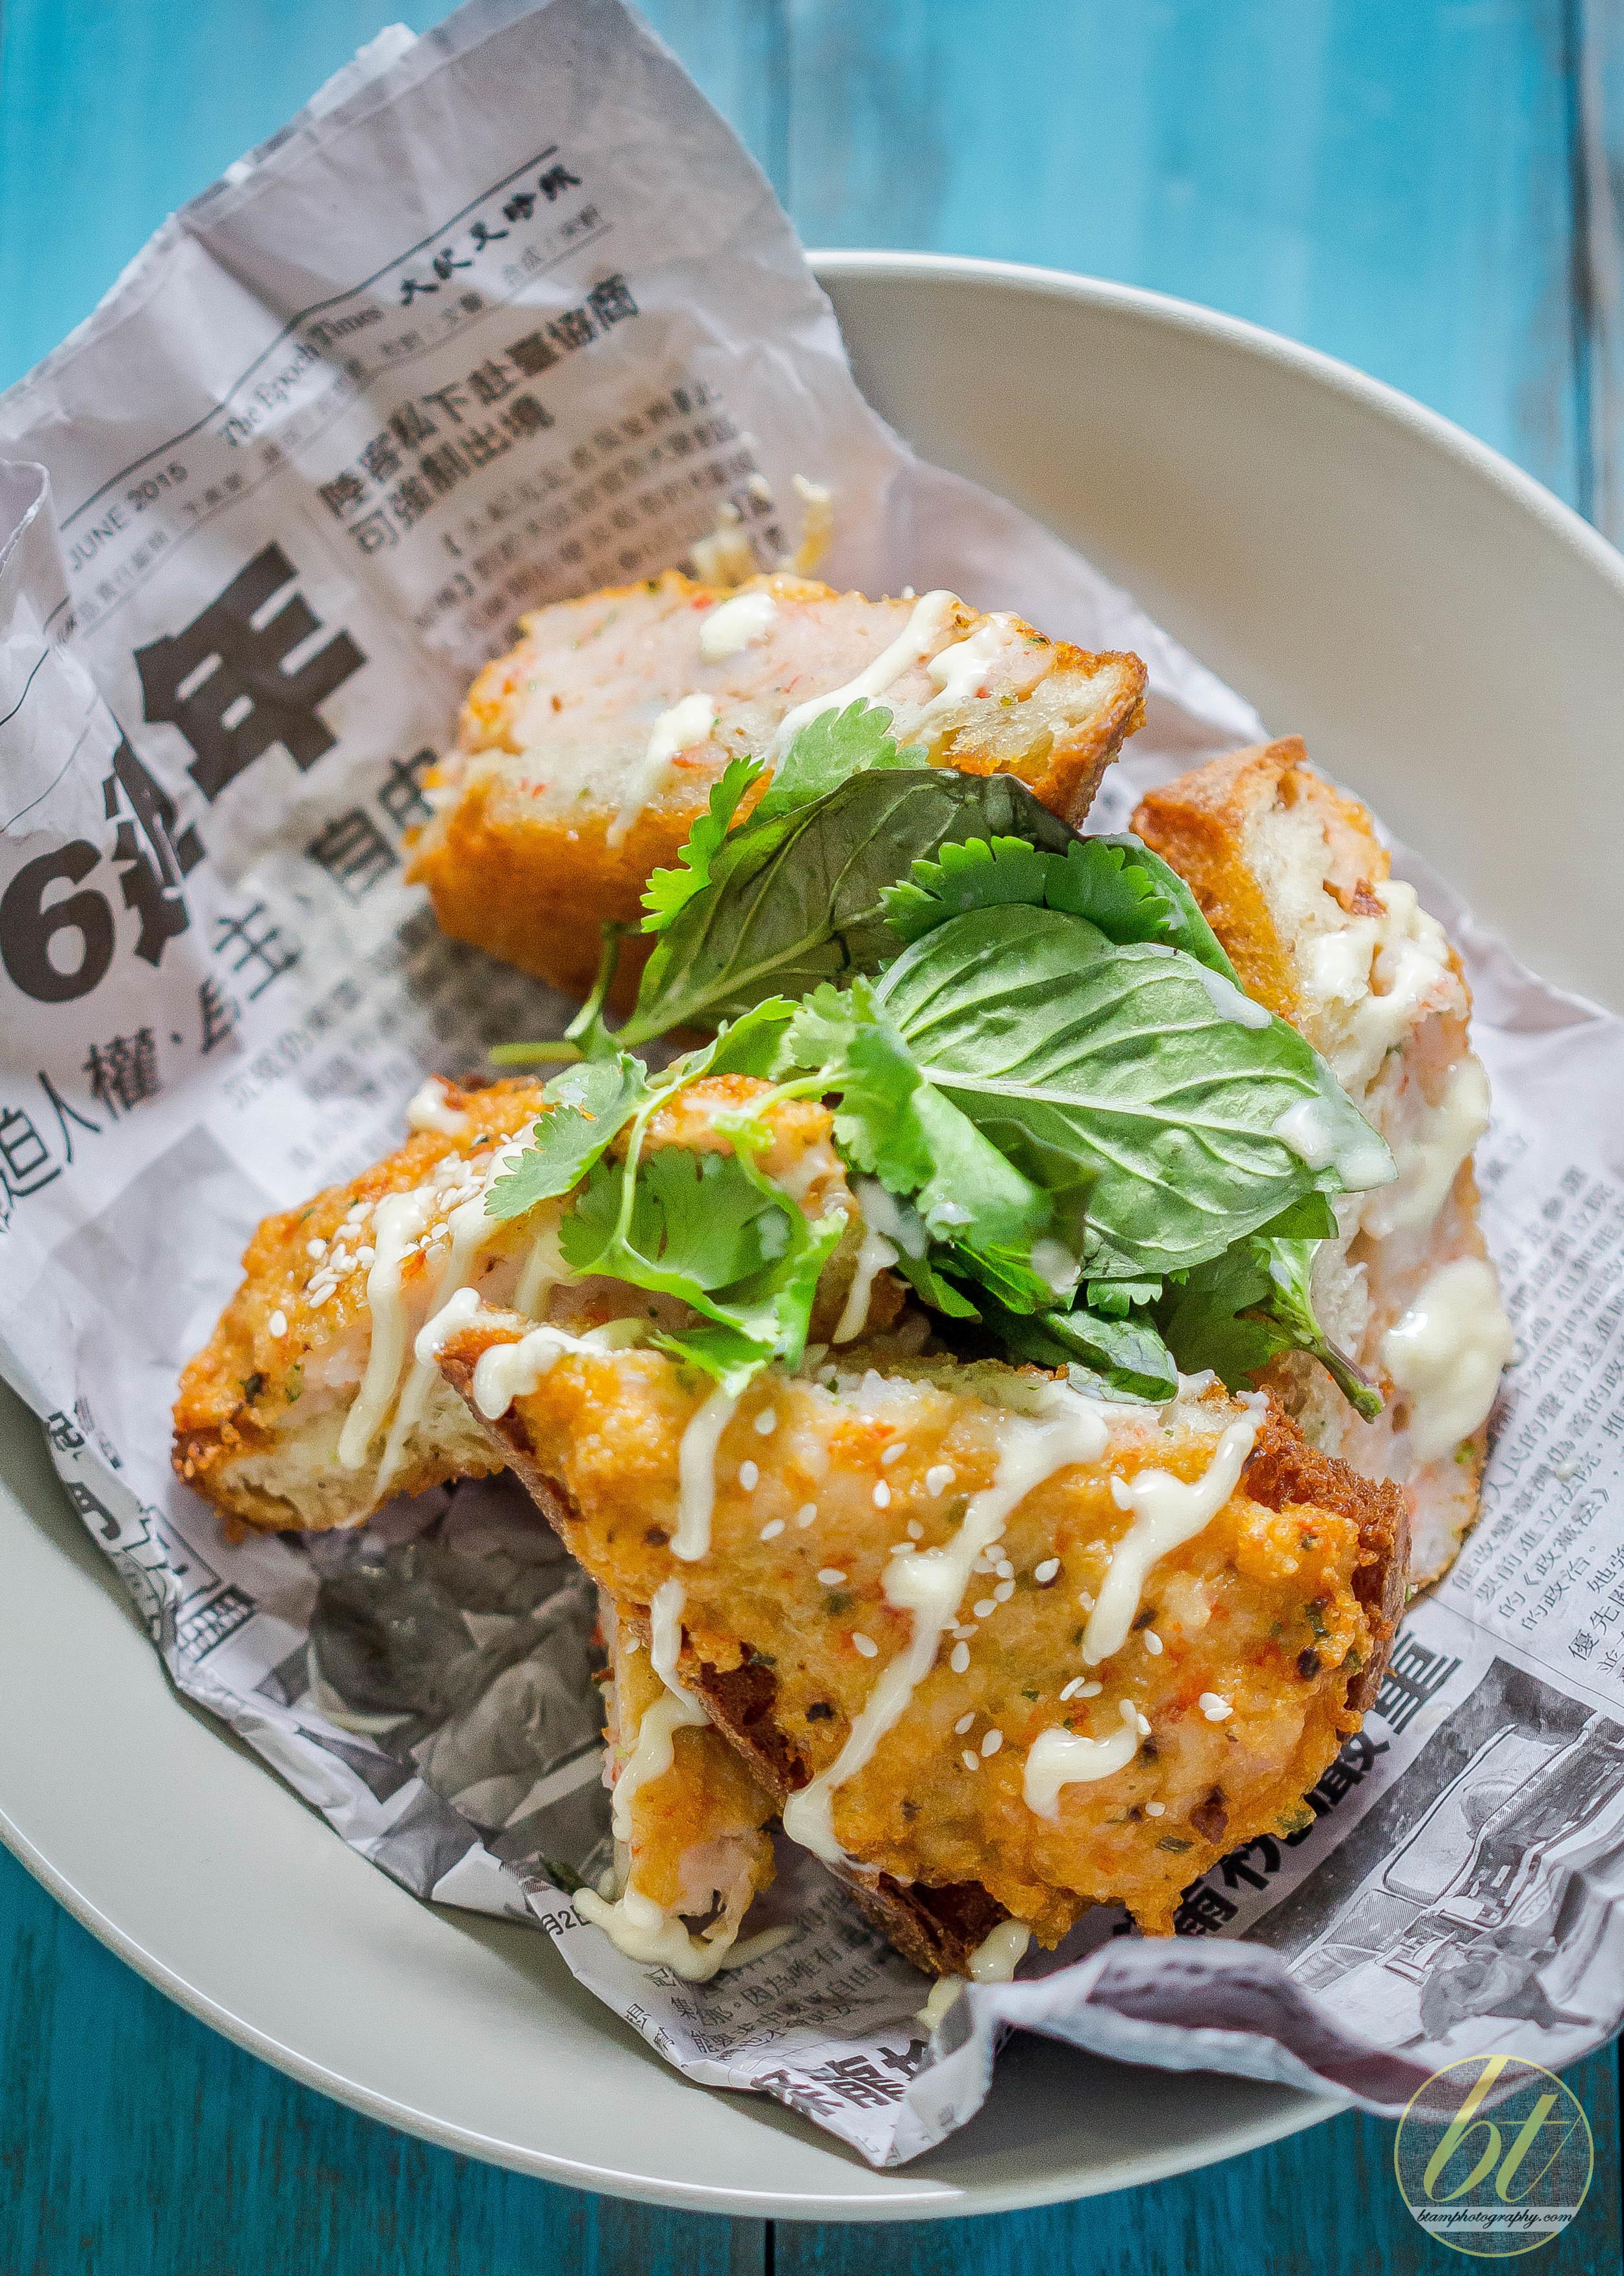 Prawn Toast with Yuzu Mayonnaise (a Dan Hong recipe)